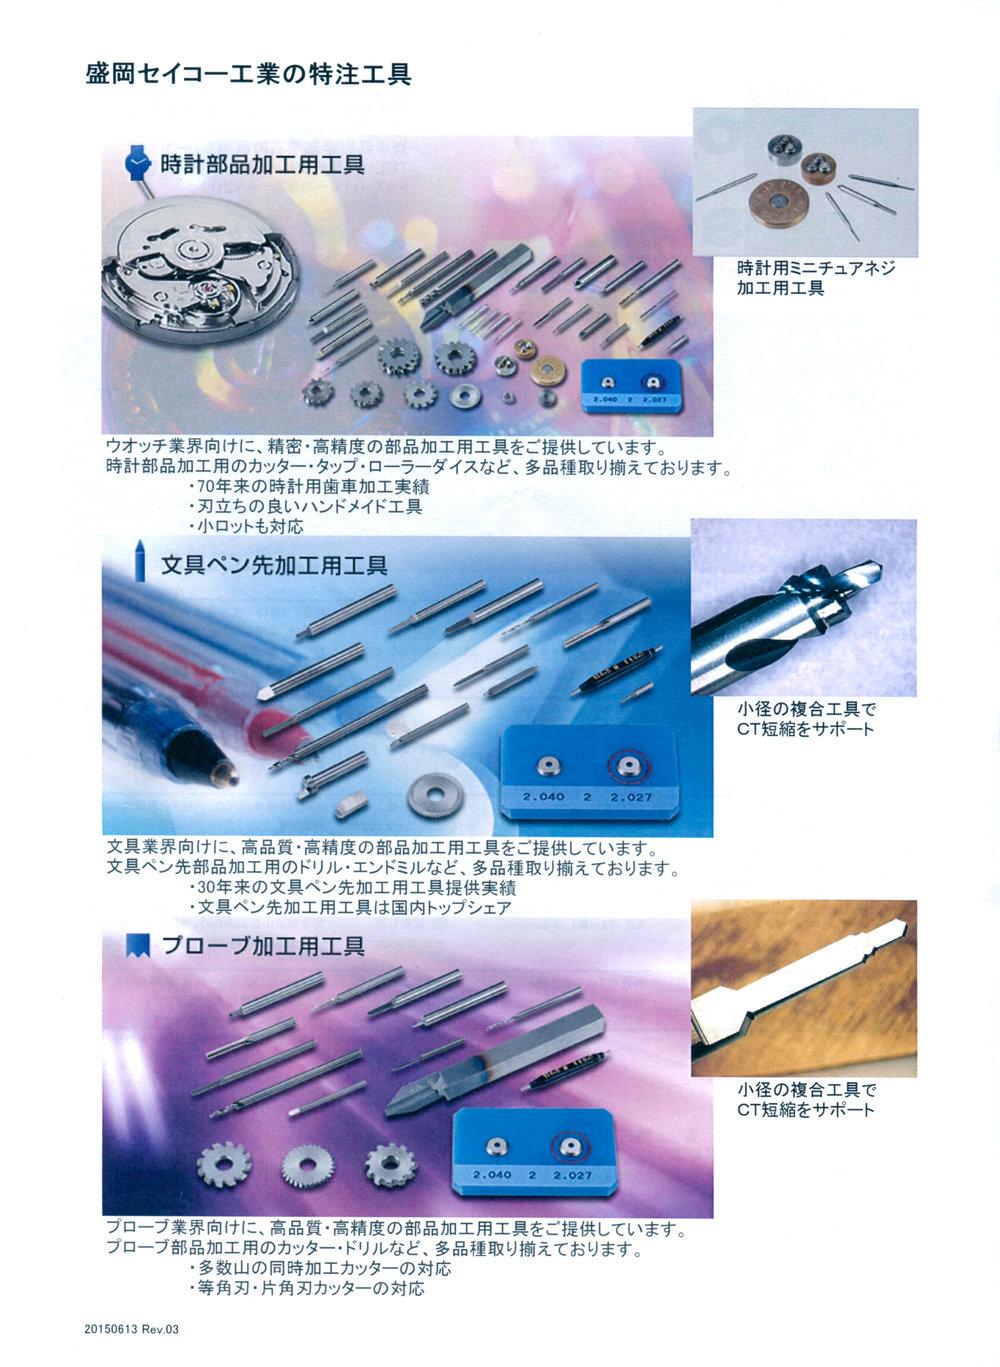 Tool Range